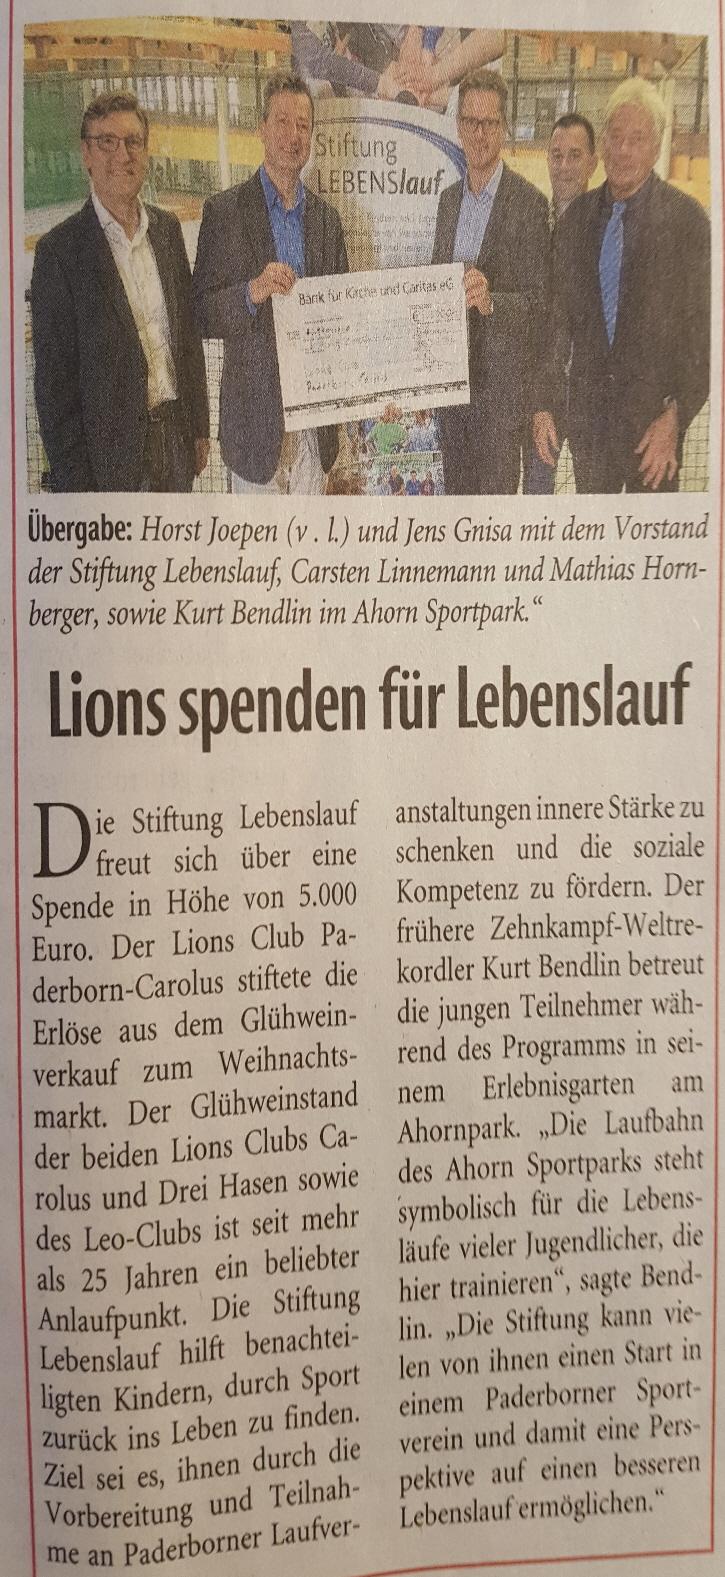 Read more about the article Lions spenden für Lebenslauf